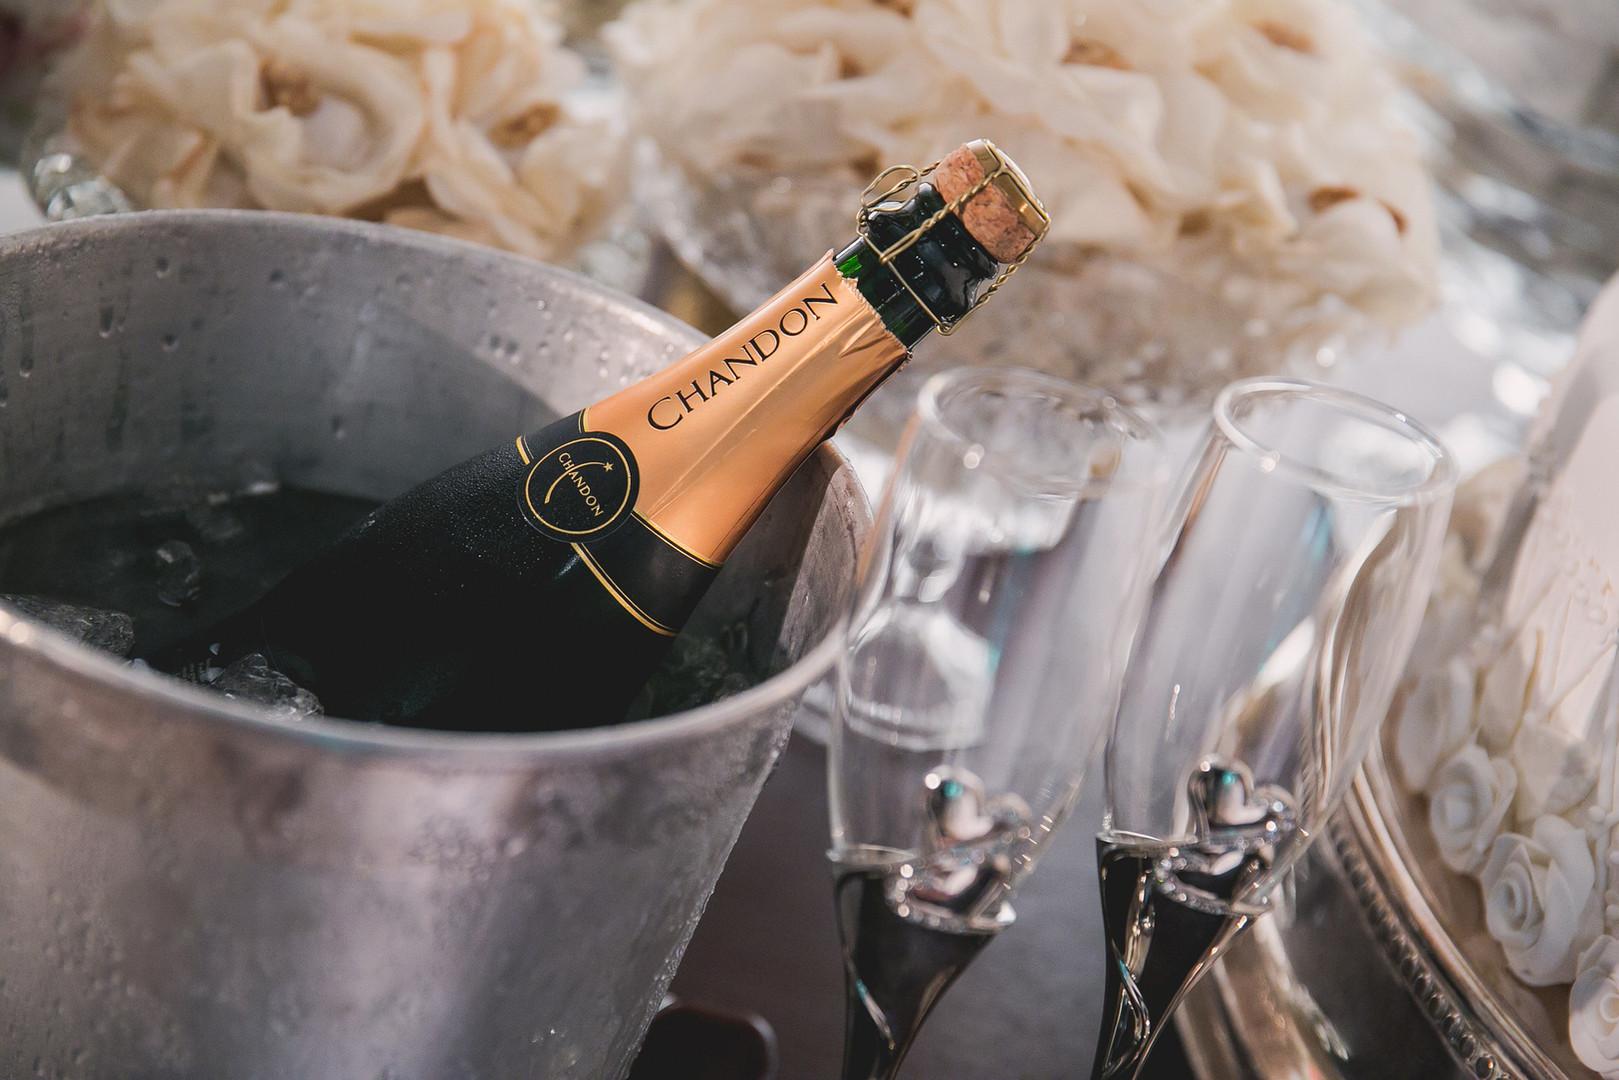 Champagne & Glasses